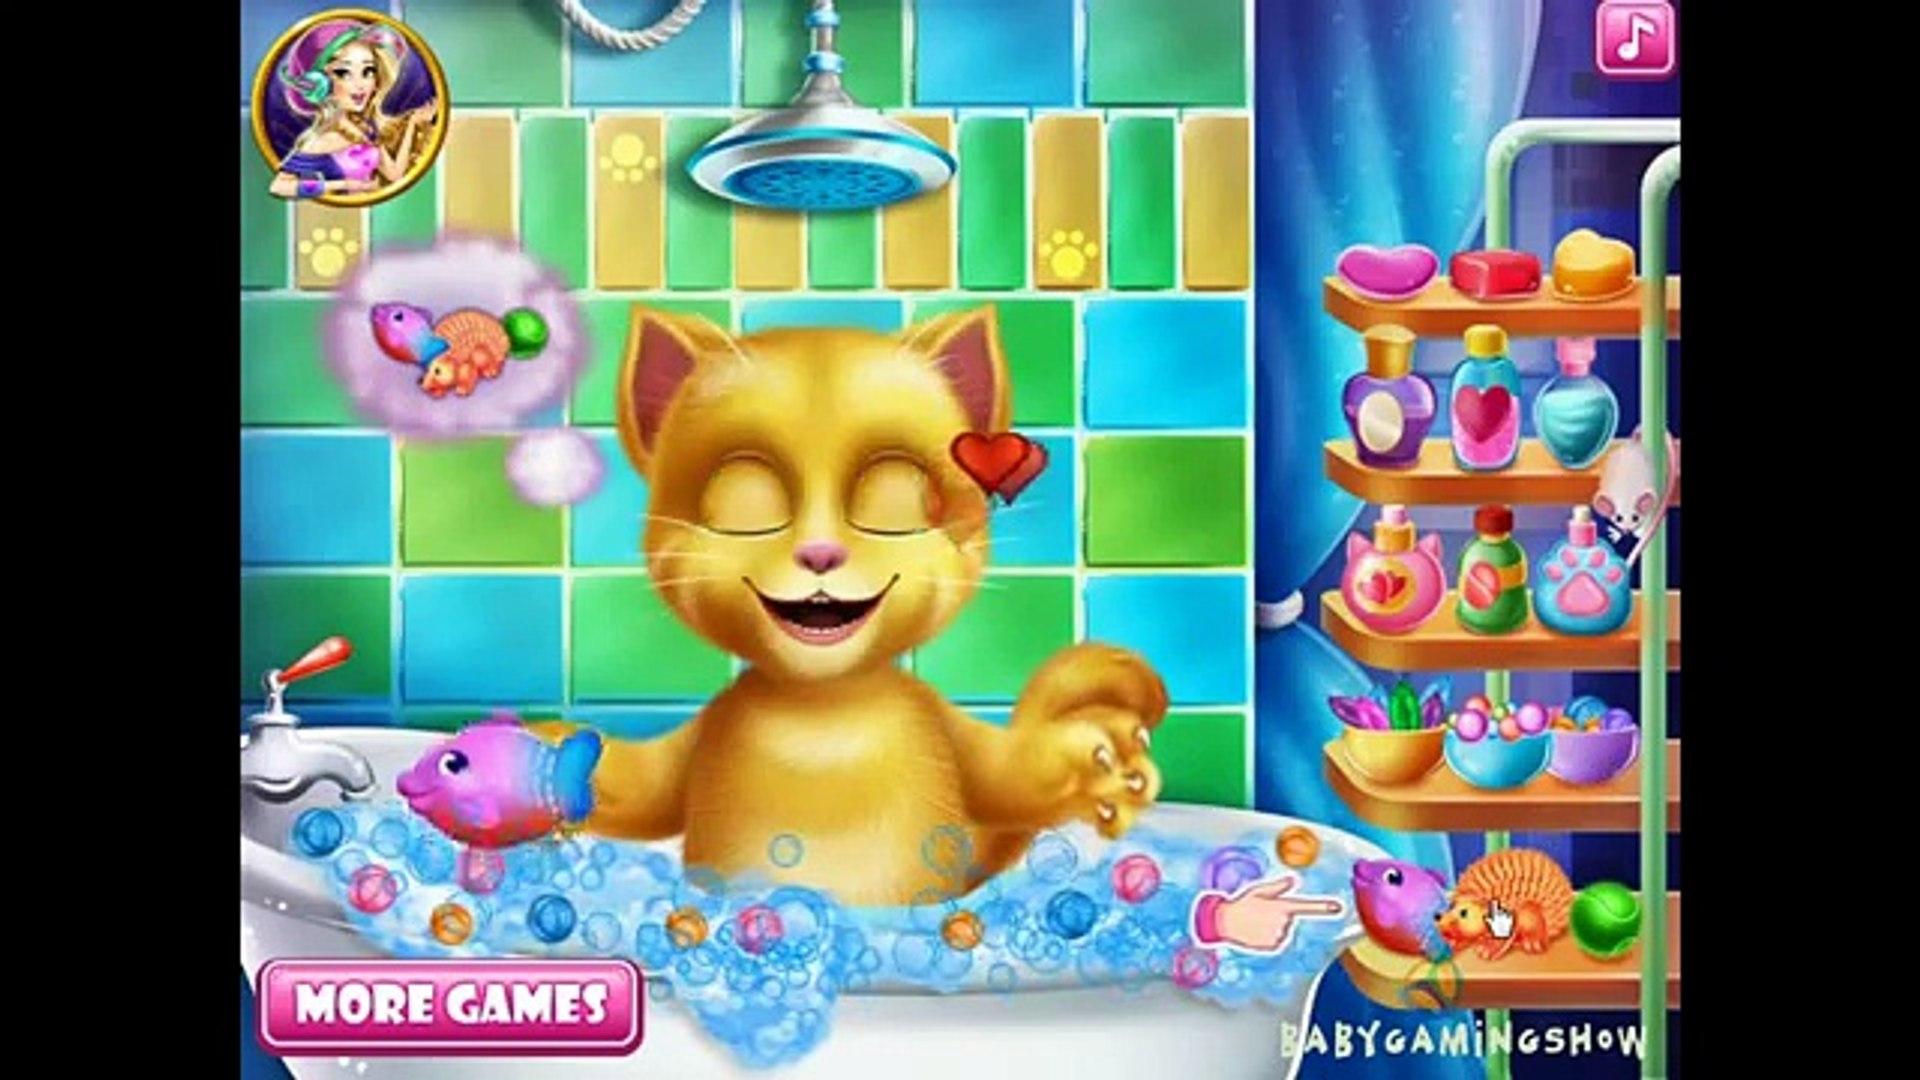 Babygamingshow - Dress Up - Animal & Pets - Baby Ginger Bath